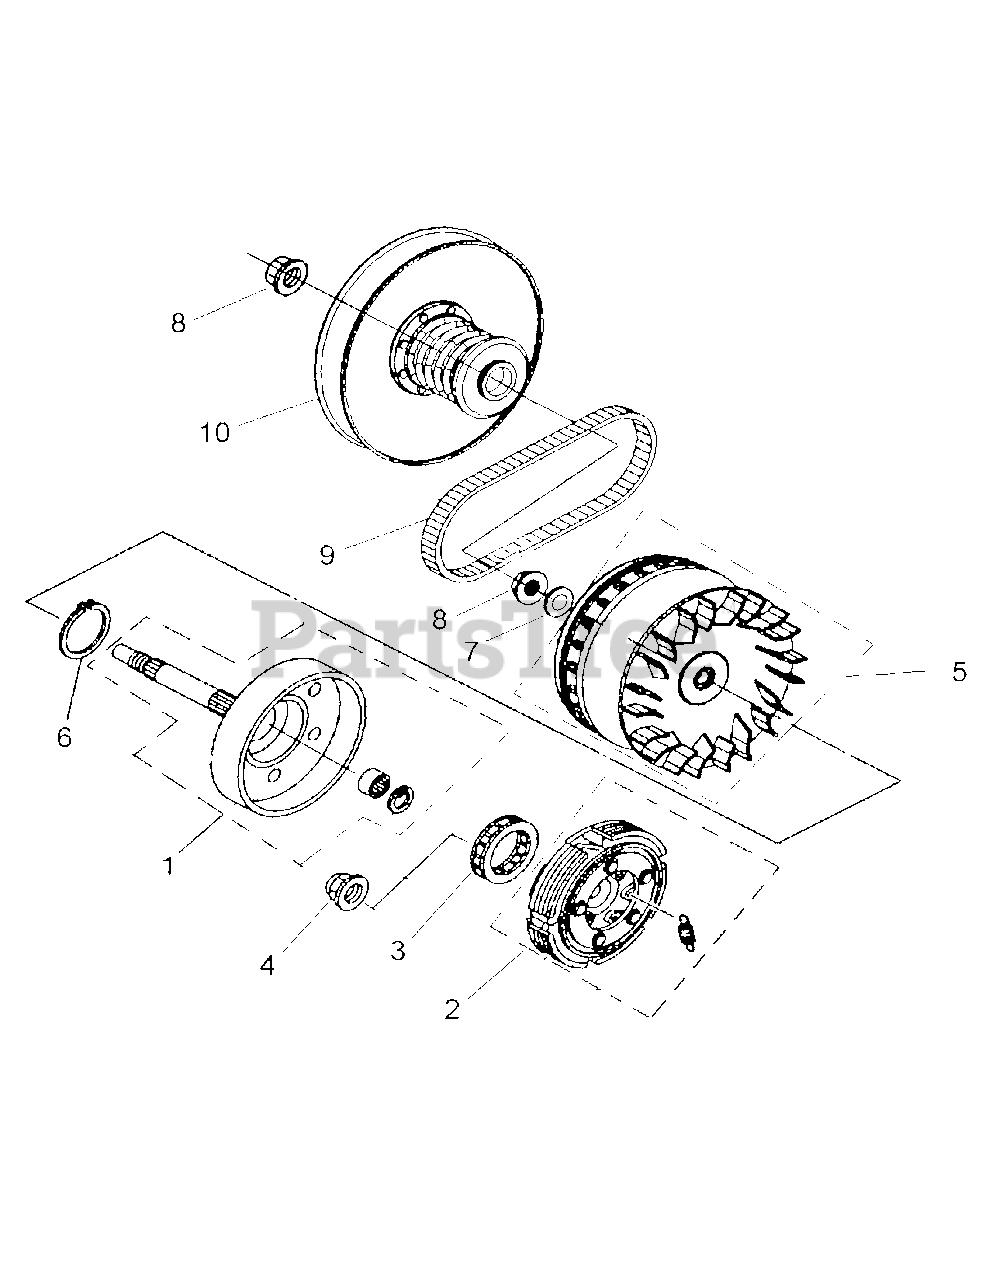 [DIAGRAM] Cub Cadet Challenger Wiring Diagram FULL Version